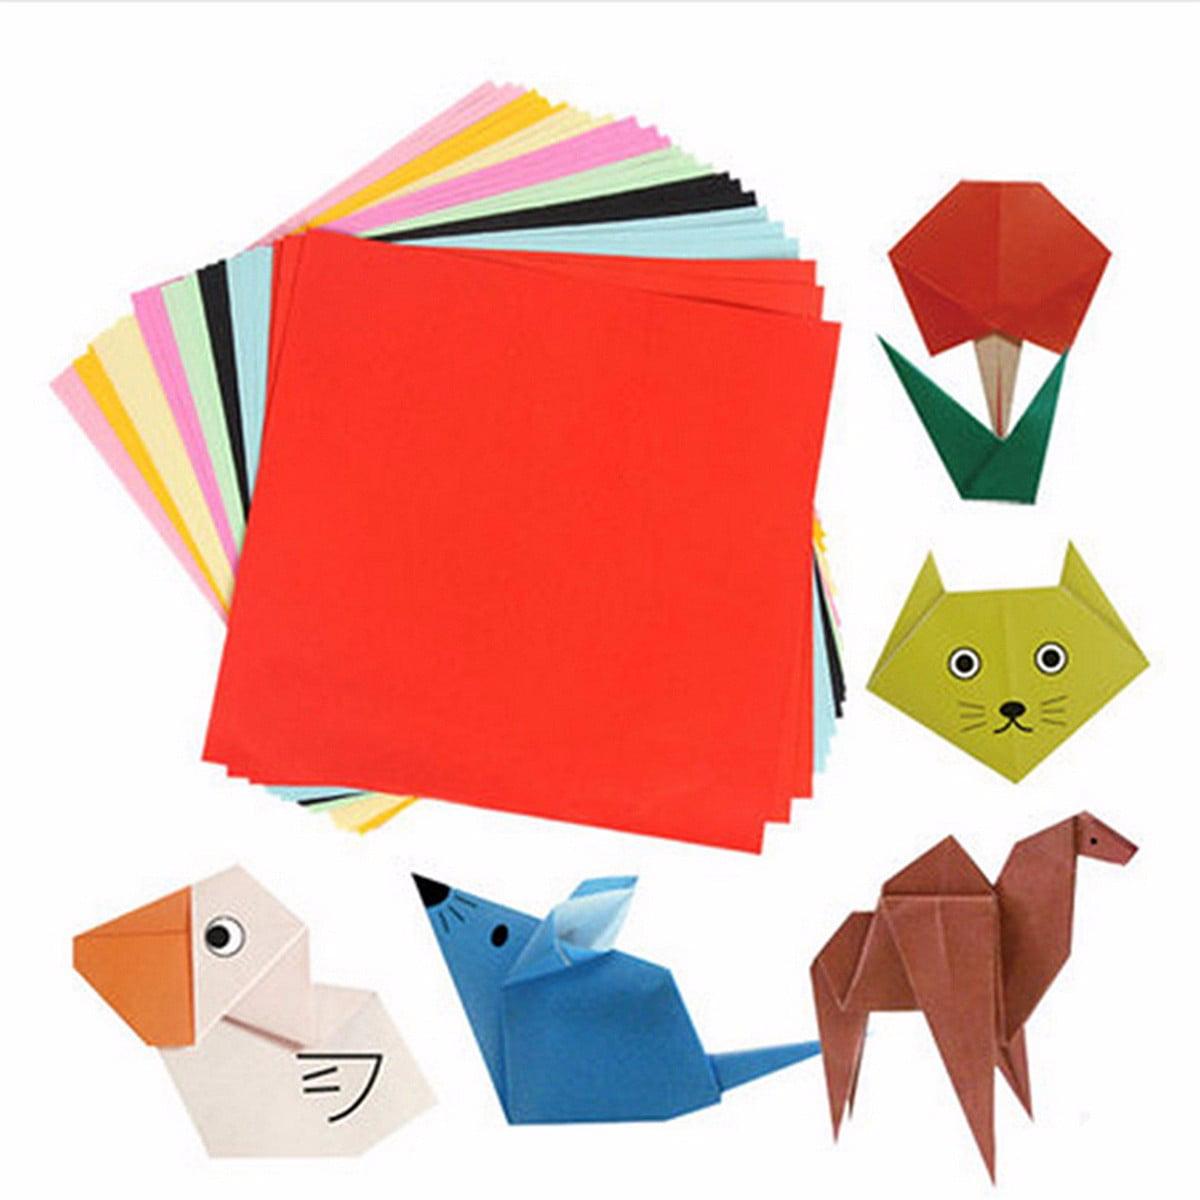 100 Sheets Mixed Colors Square Folding Crane Origami DIY Craft ... | 1200x1200